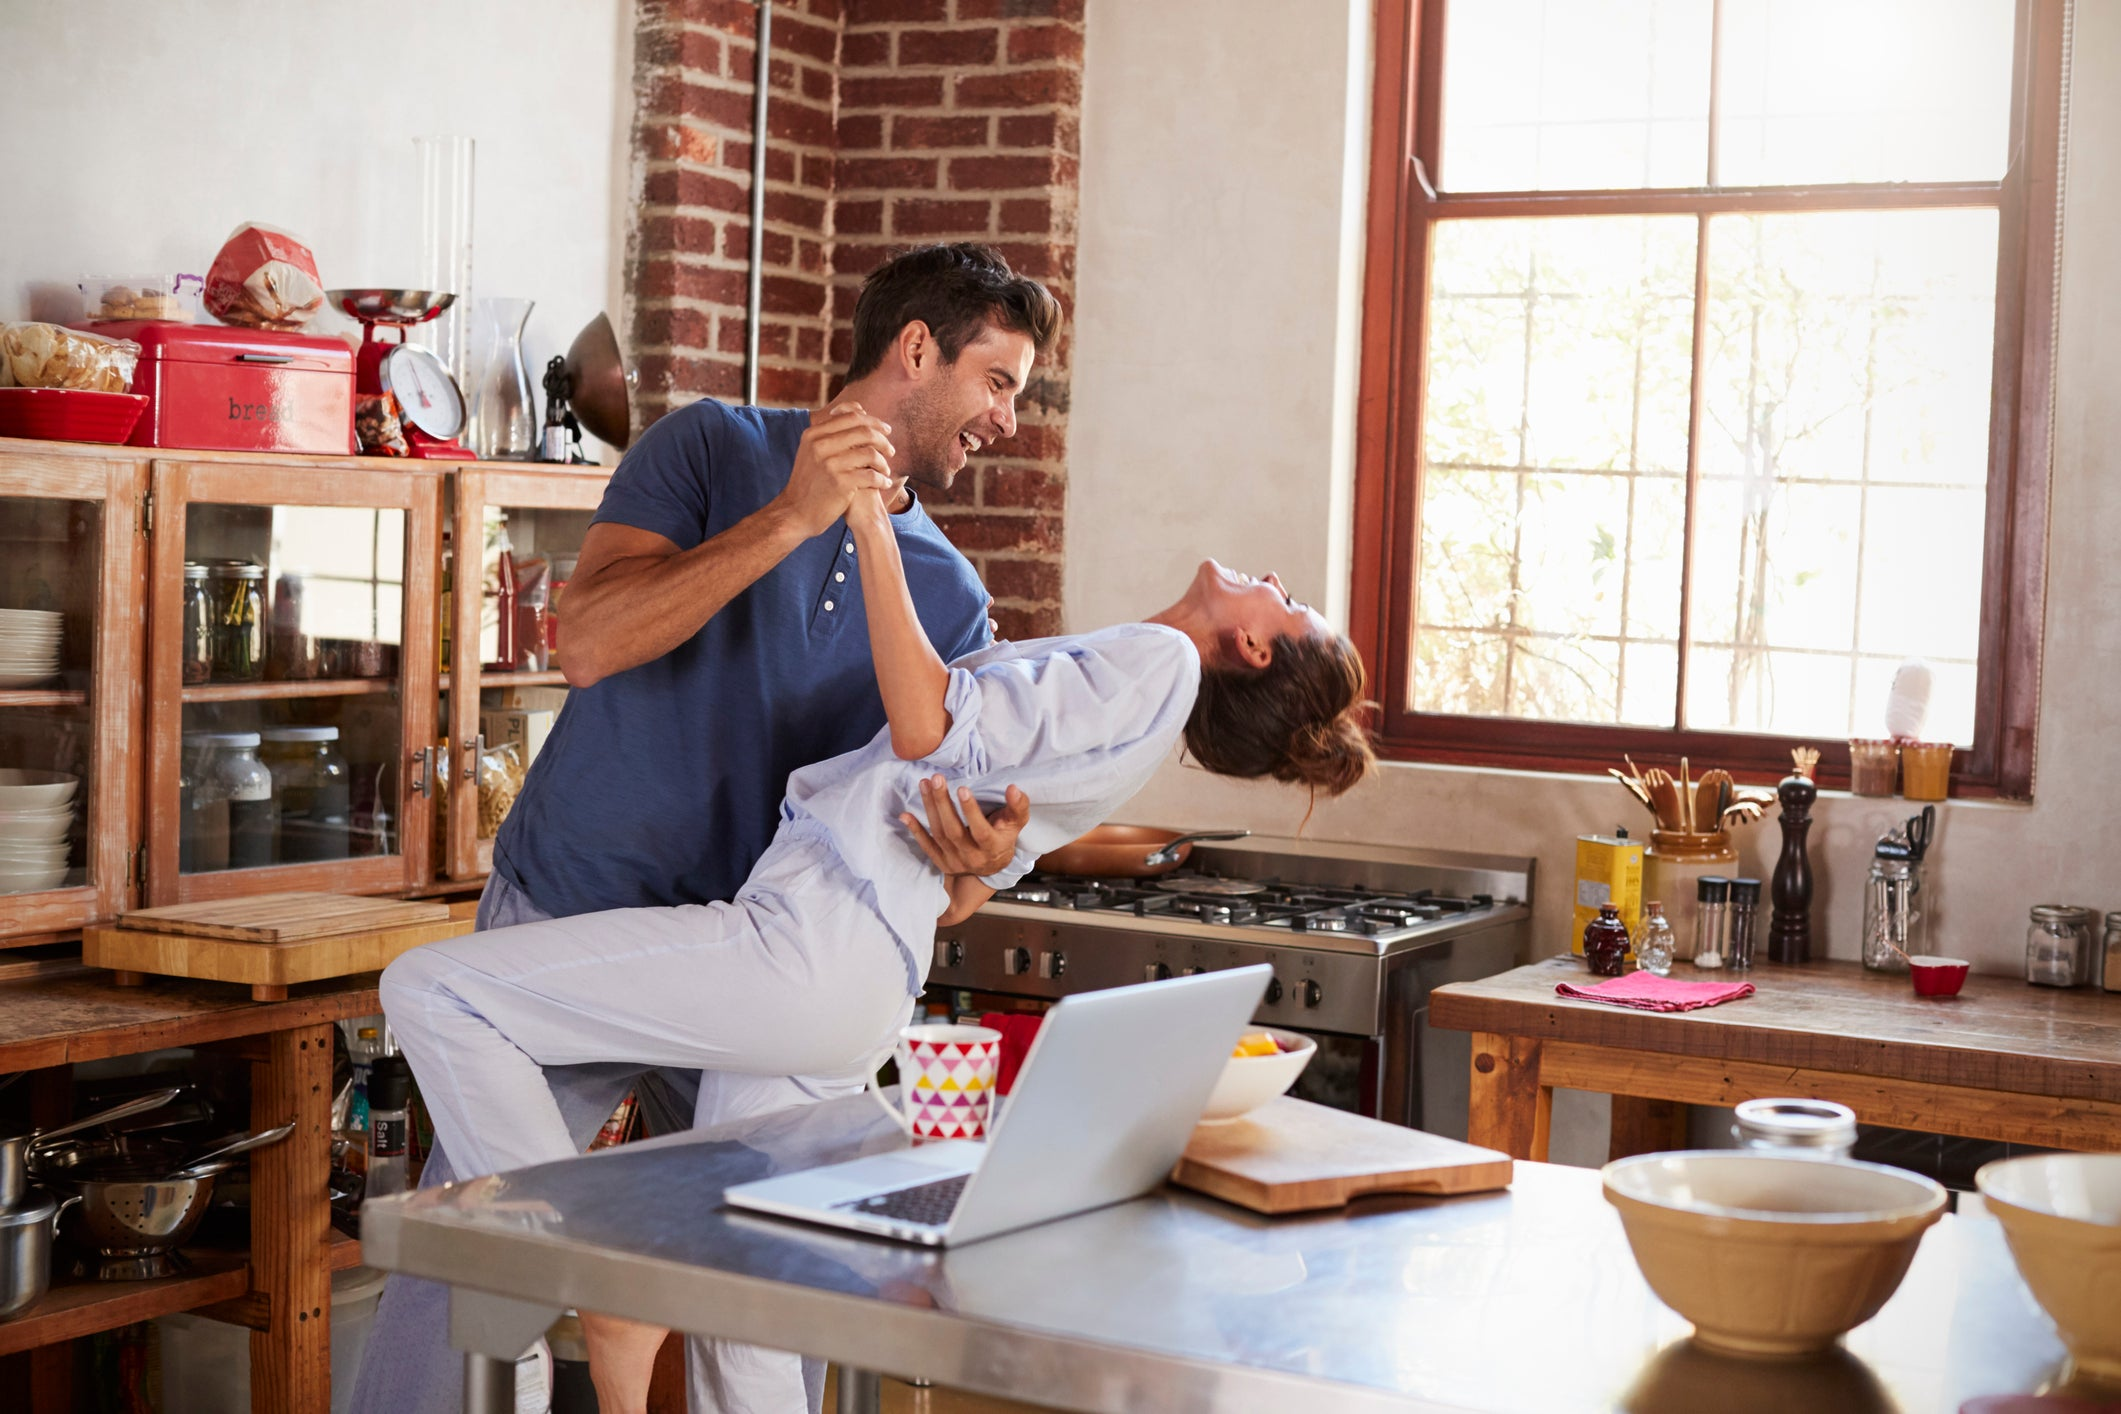 A happy couple dances in kitchen